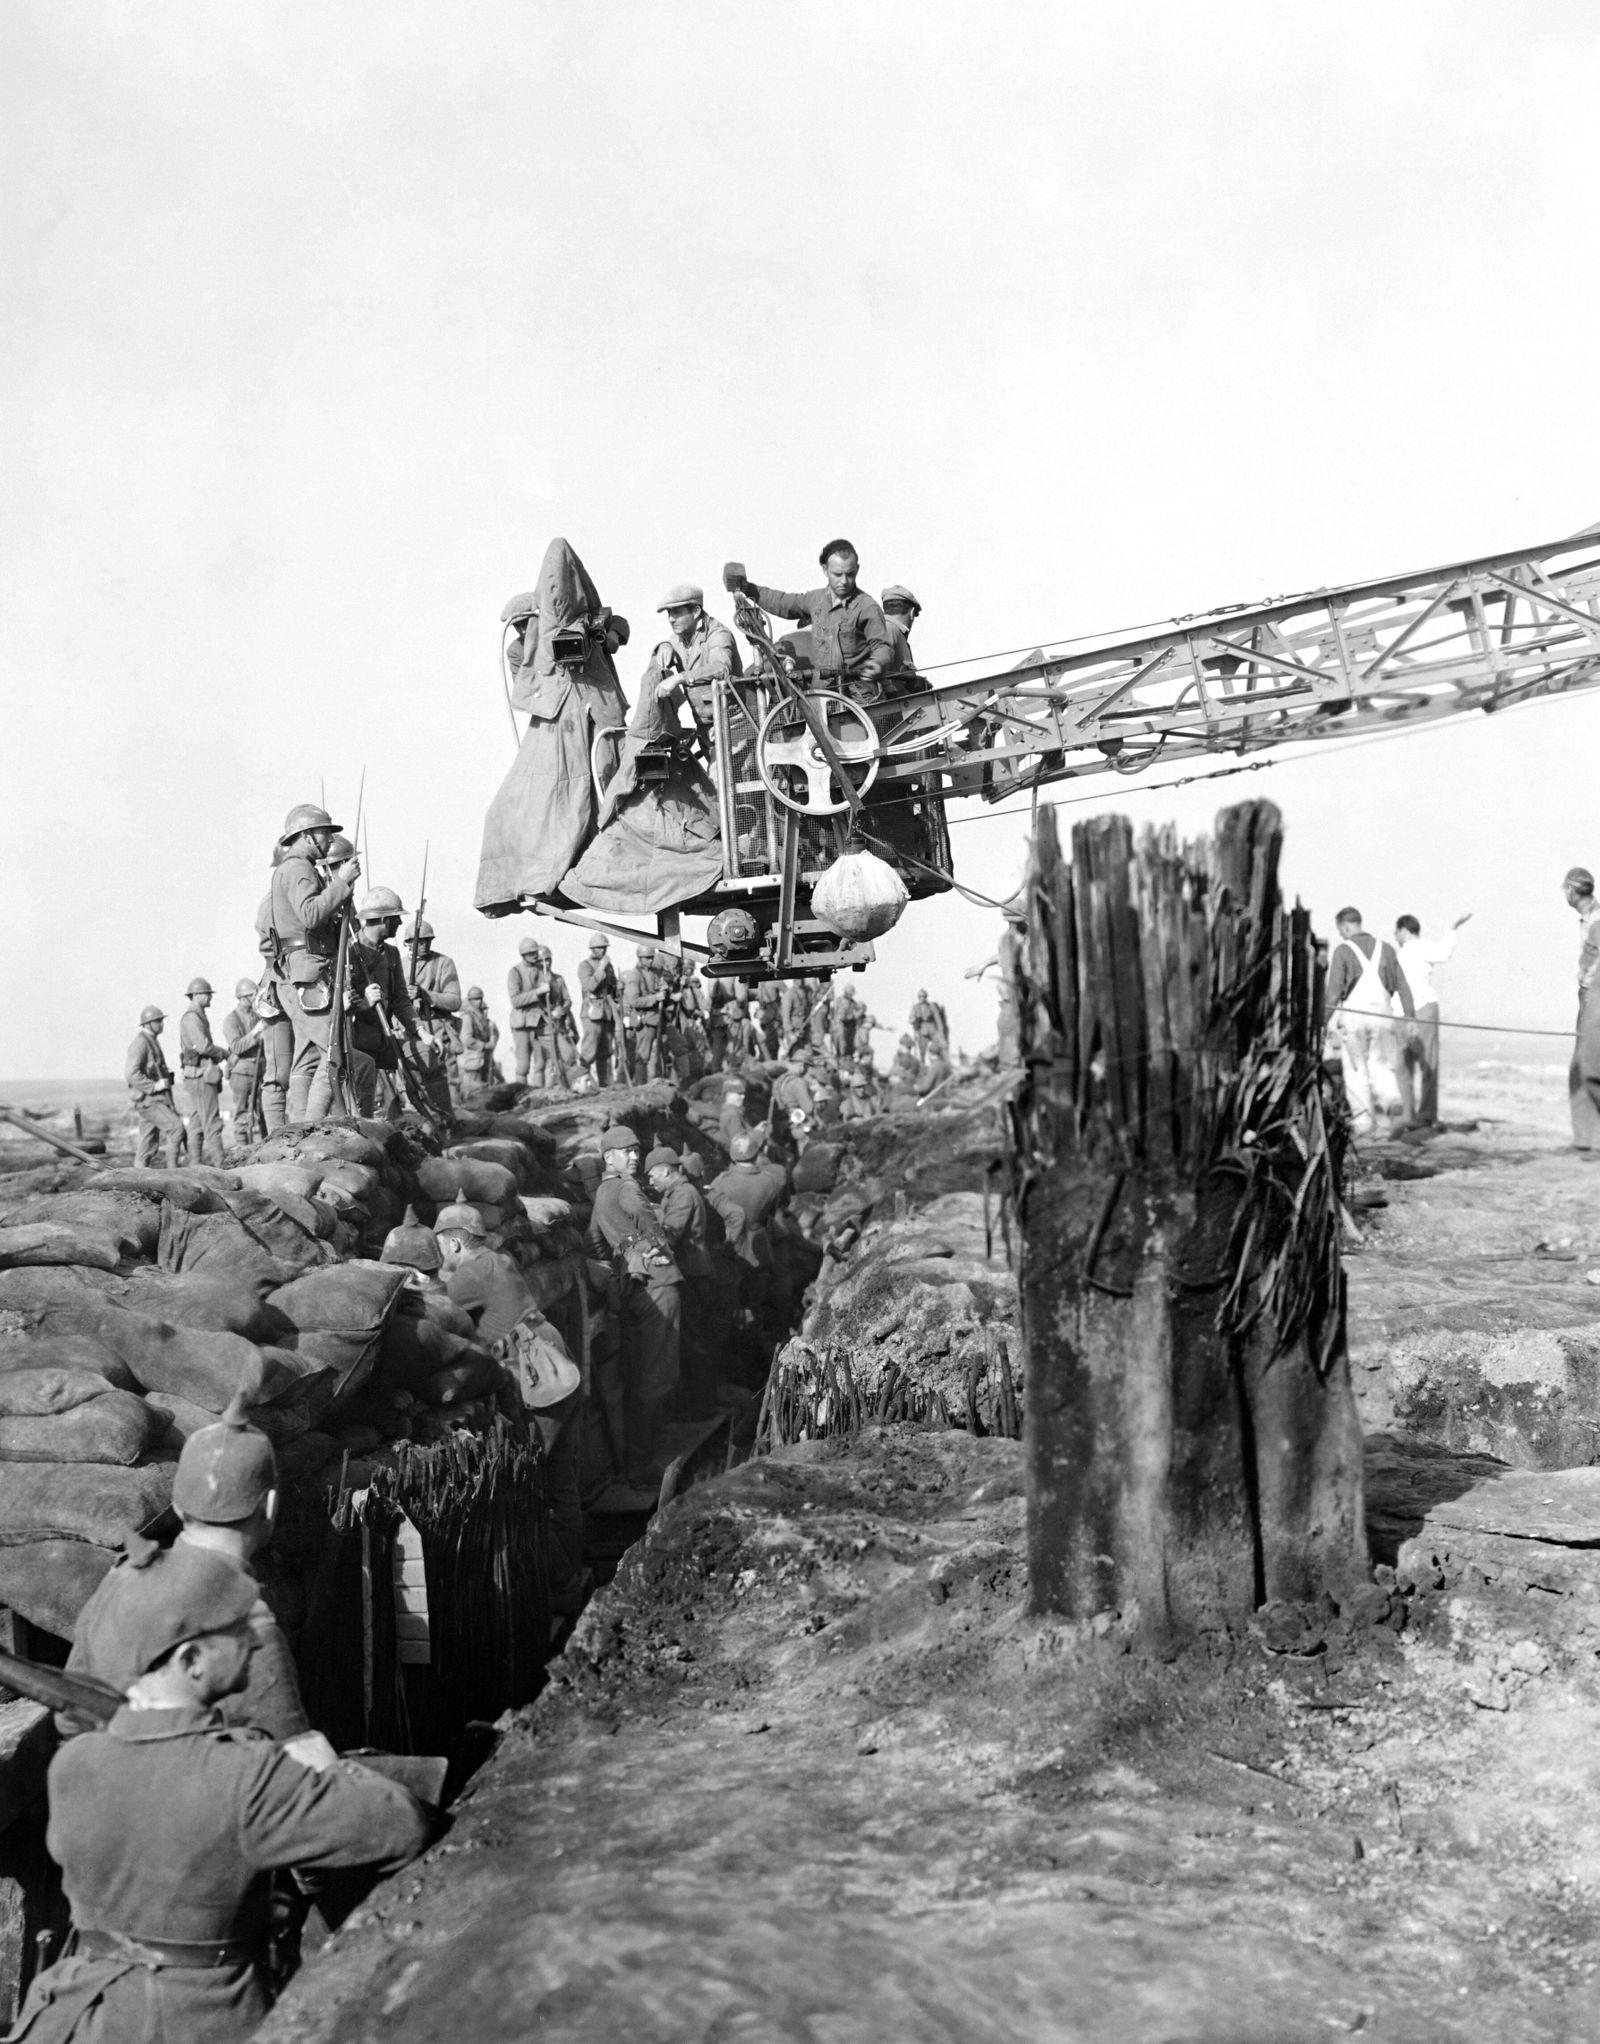 ALL QUIET ON THE WESTERN FRONT, production shot on set, 1930 !ACHTUNG AUFNAHMEDATUM GESCH?TZT! PUBLICATIONxINxGERxSUIxAU